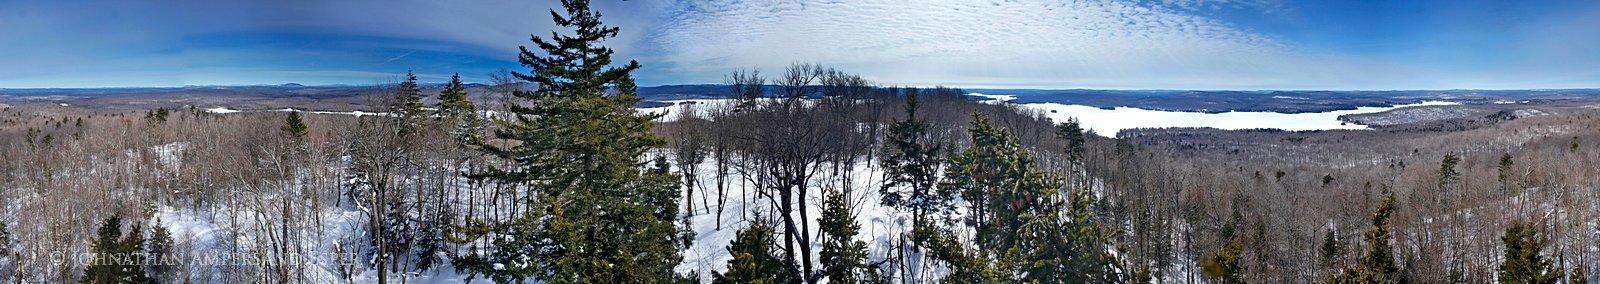 Cranberry Lake,spring,360 degree,Bear Mt,treetop,panorama,360 degree, photo